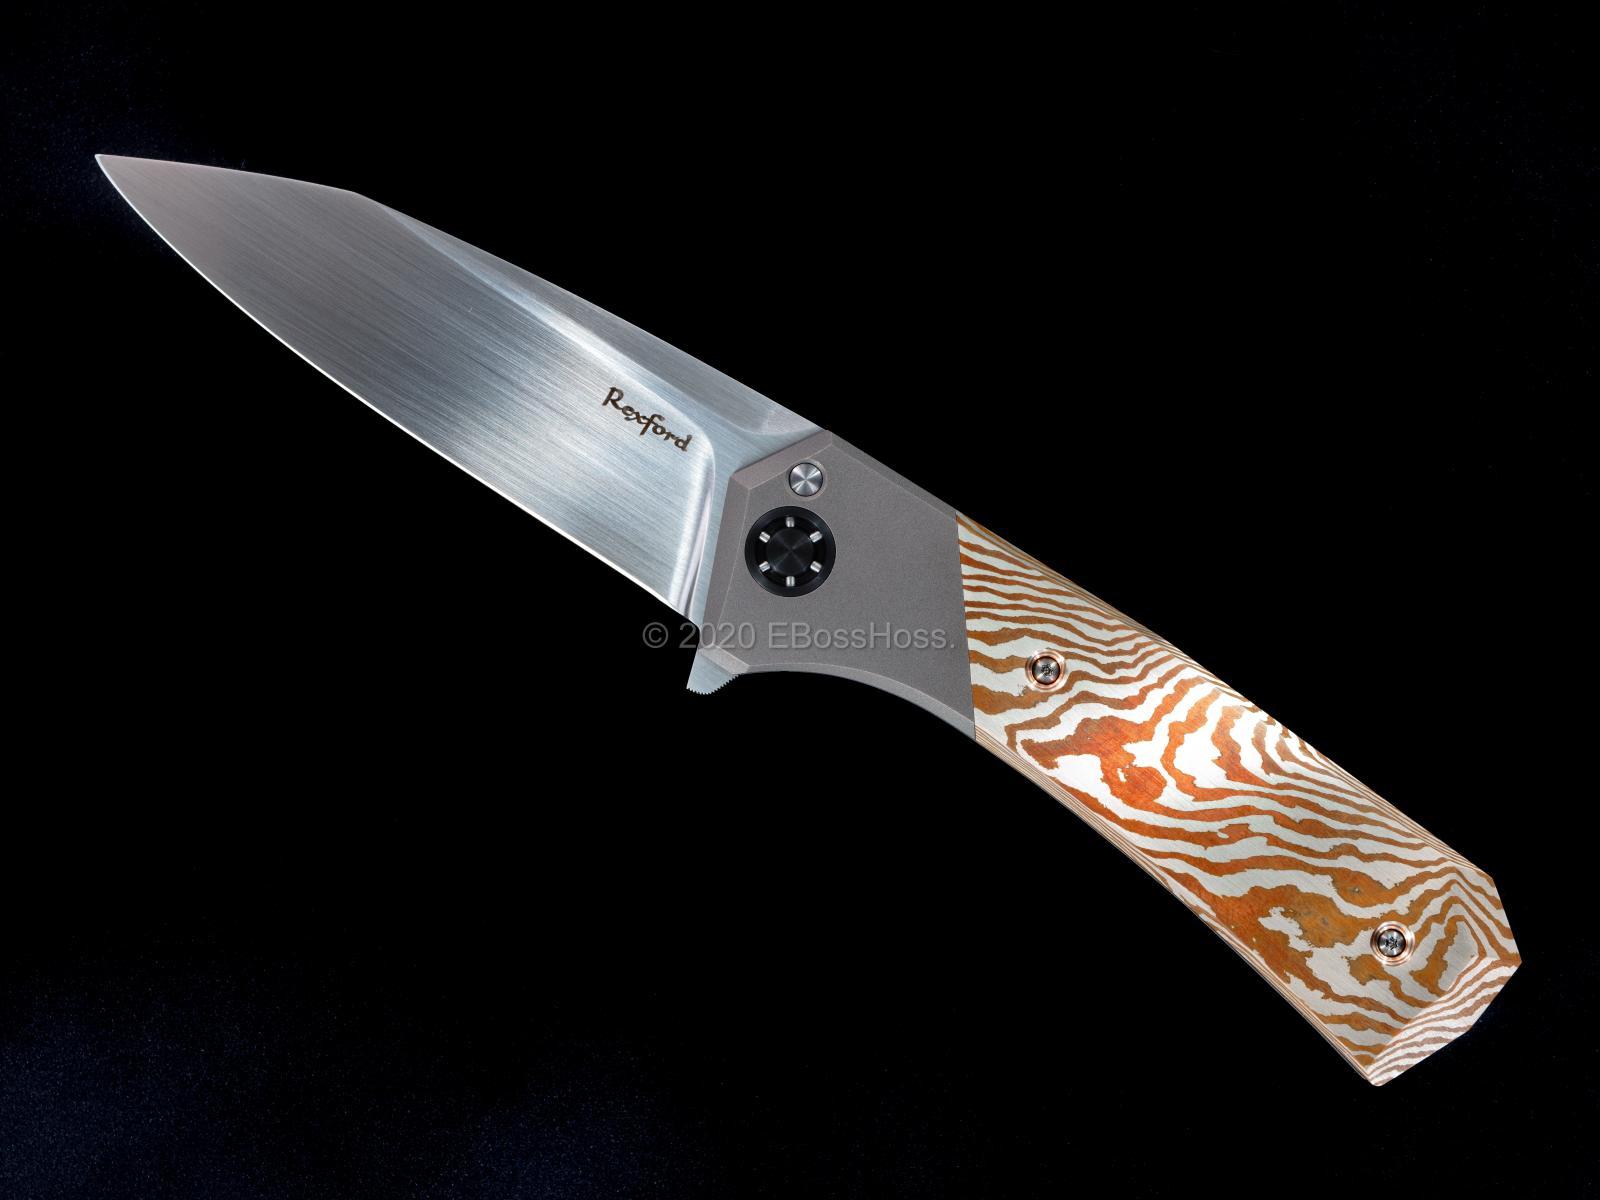 Todd Rexford Custom Deluxe Cesium XL Flipper